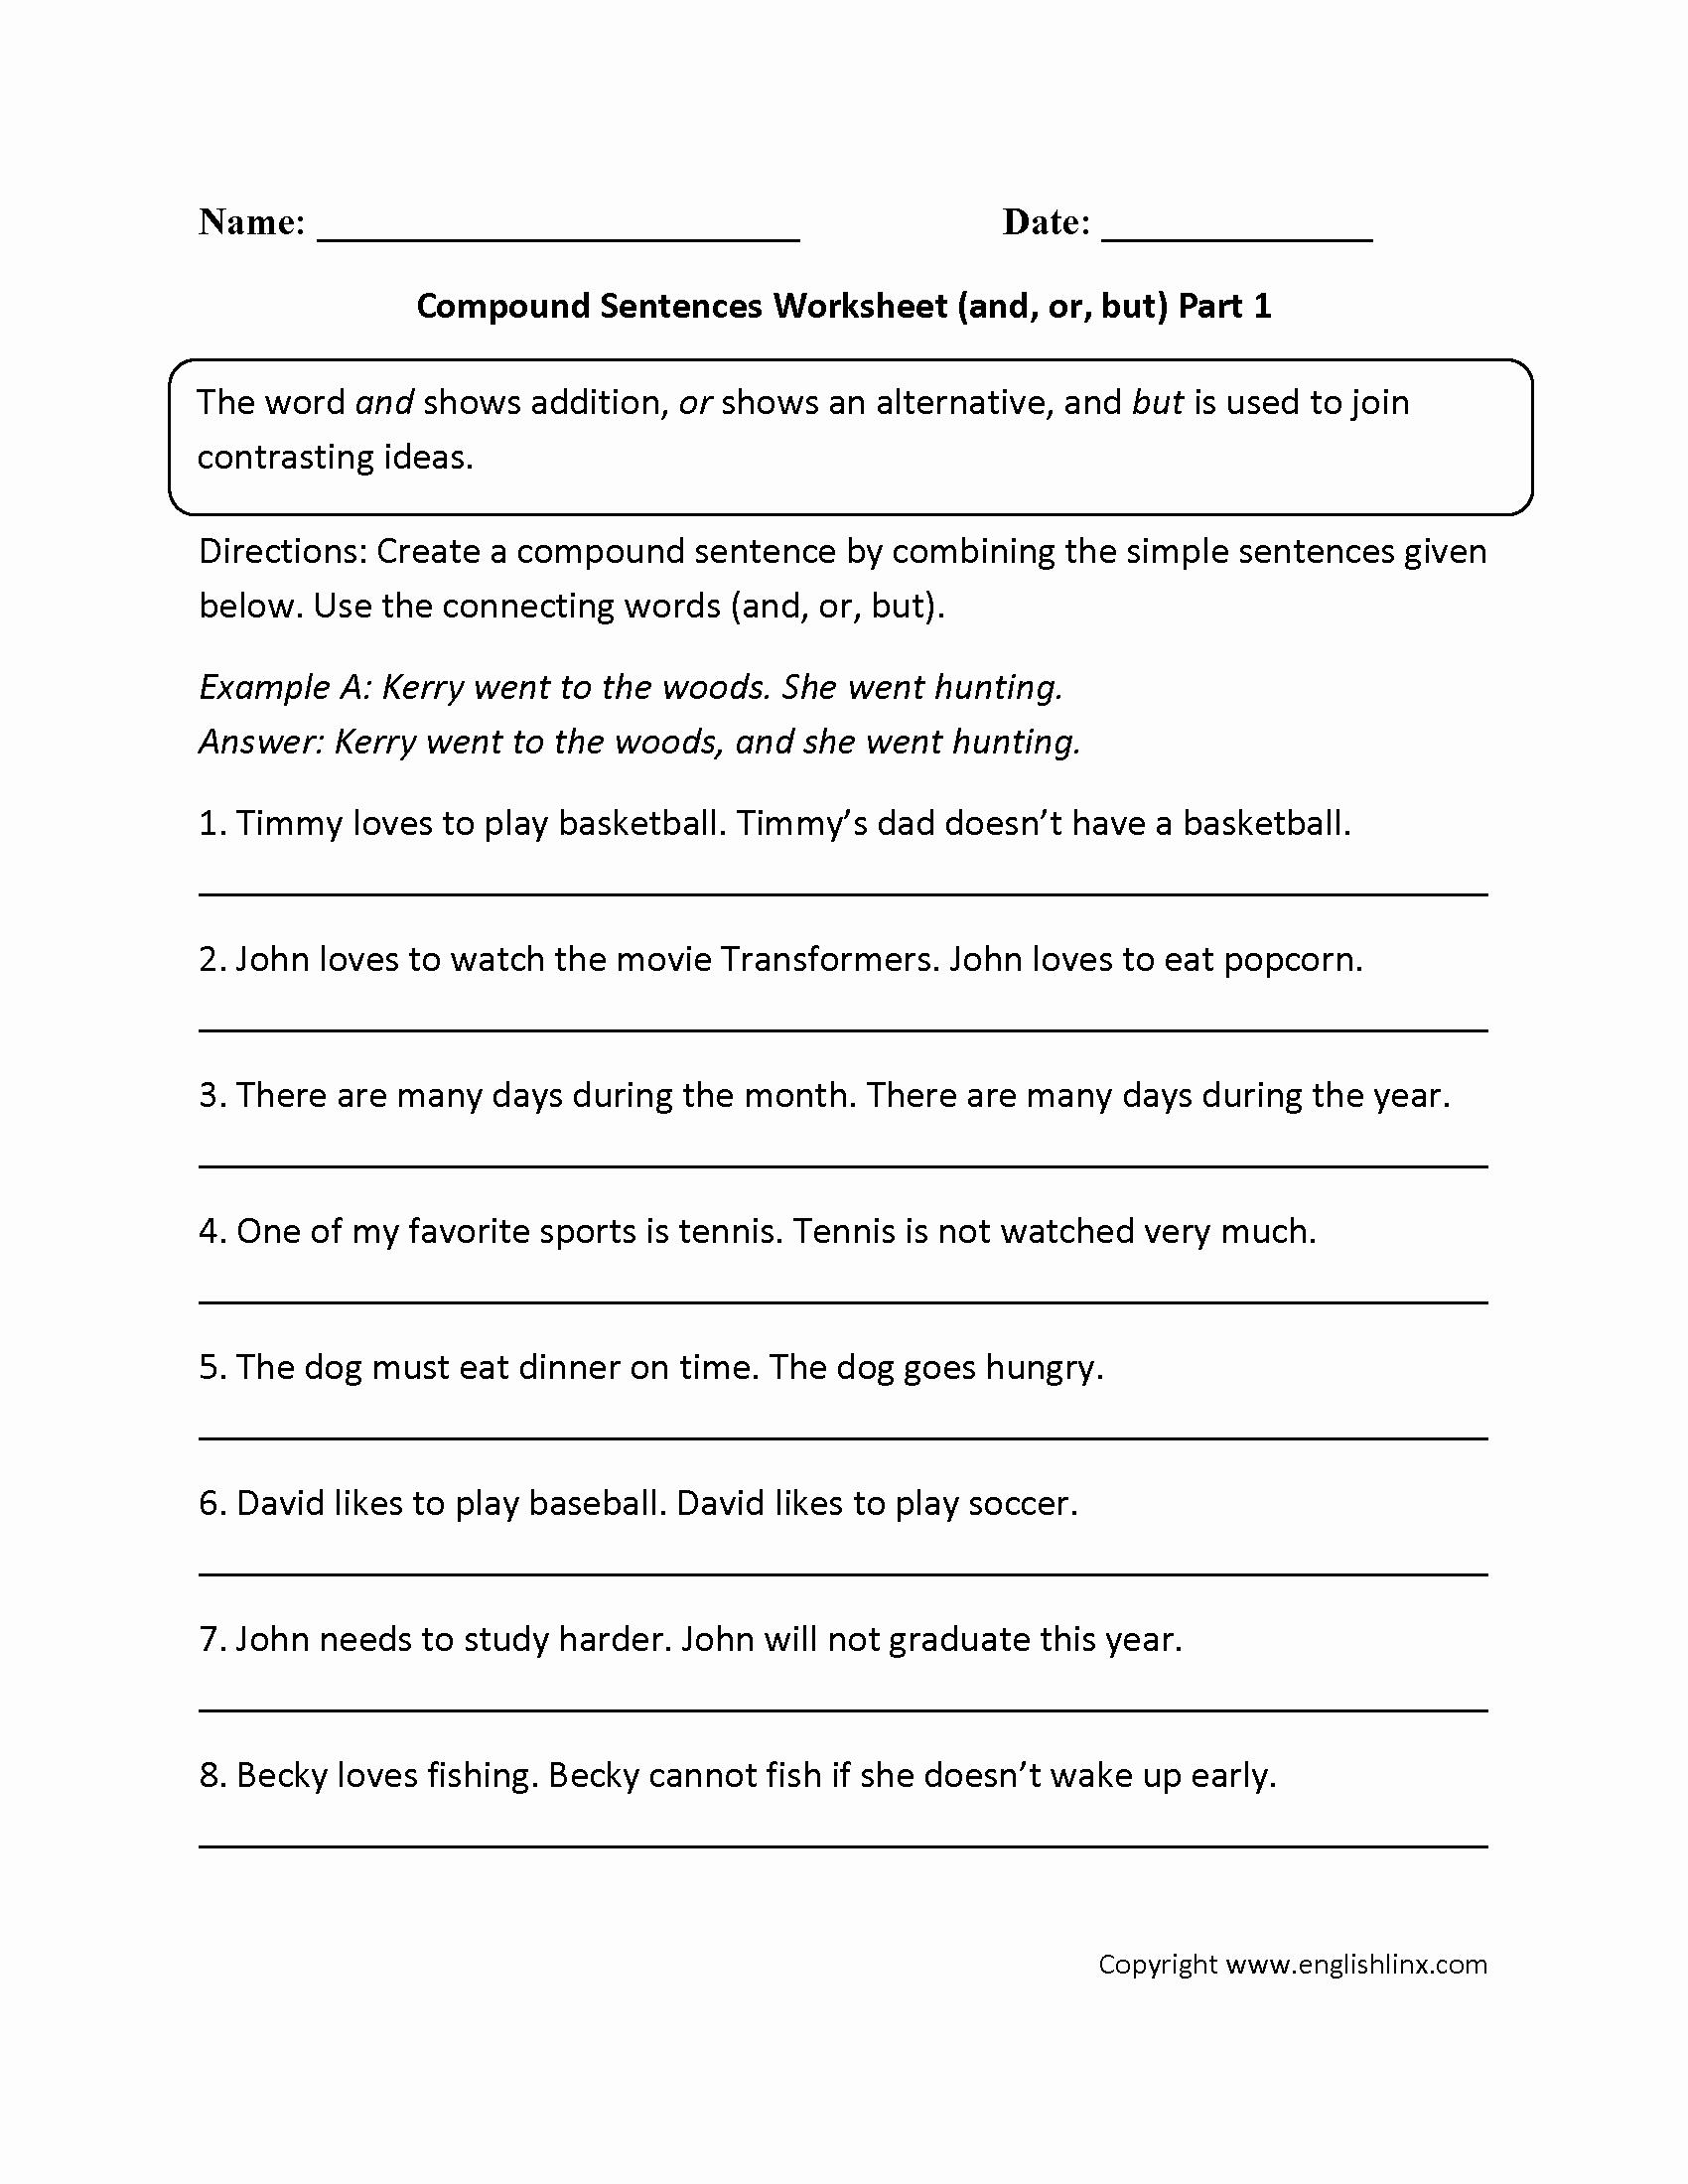 Compound Complex Sentences Worksheet Awesome Sentences Worksheets